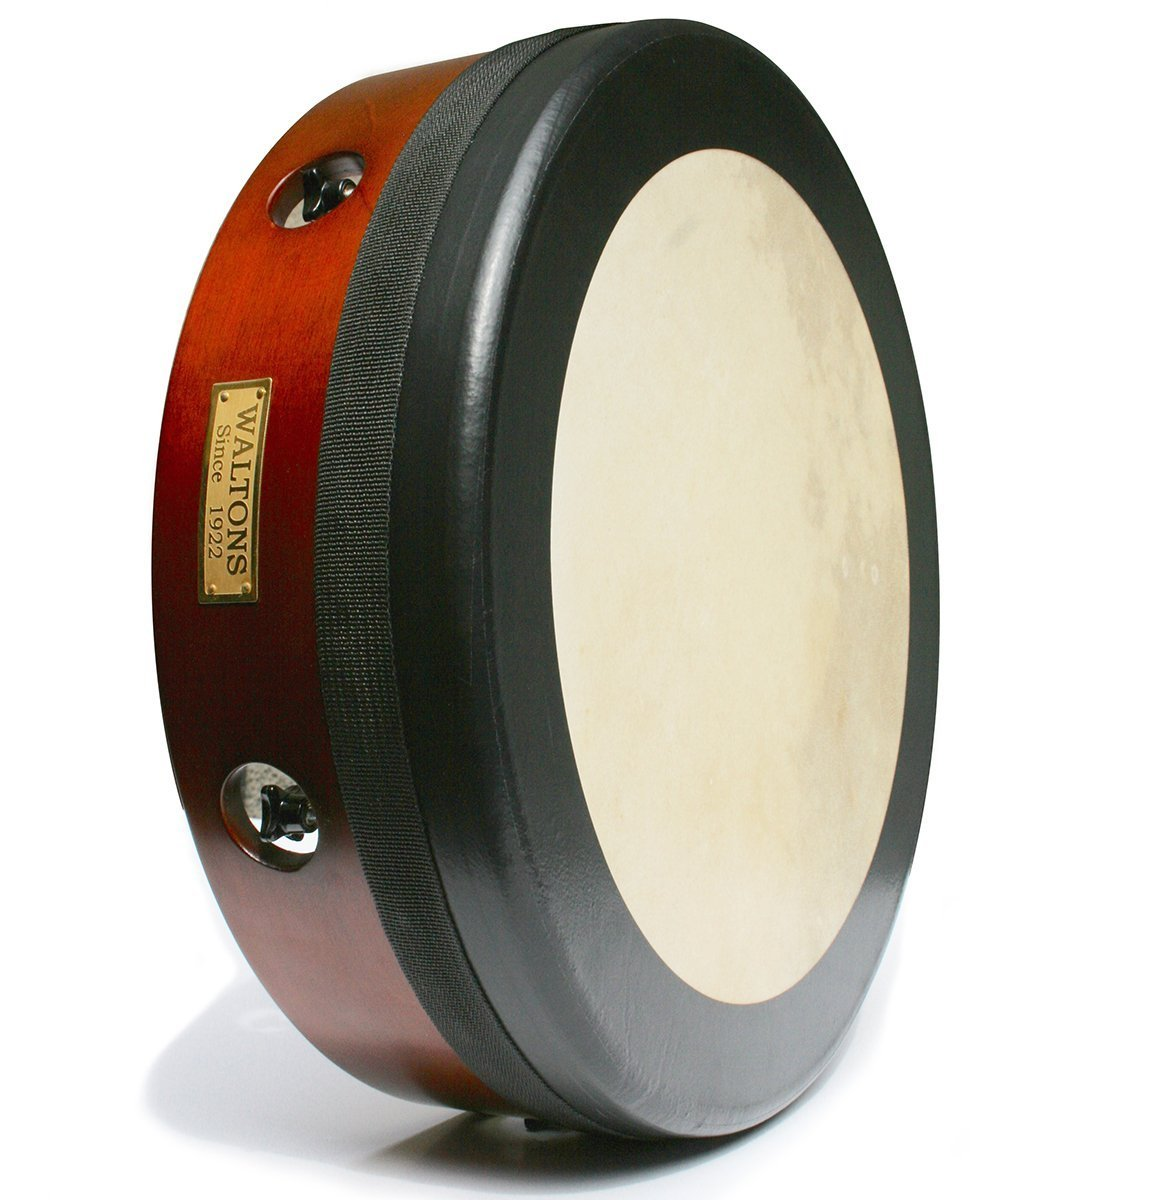 Waltons 14'' Hand Tuneable Bodhran Light Frame - Mahogany (10AWAL-T4144)